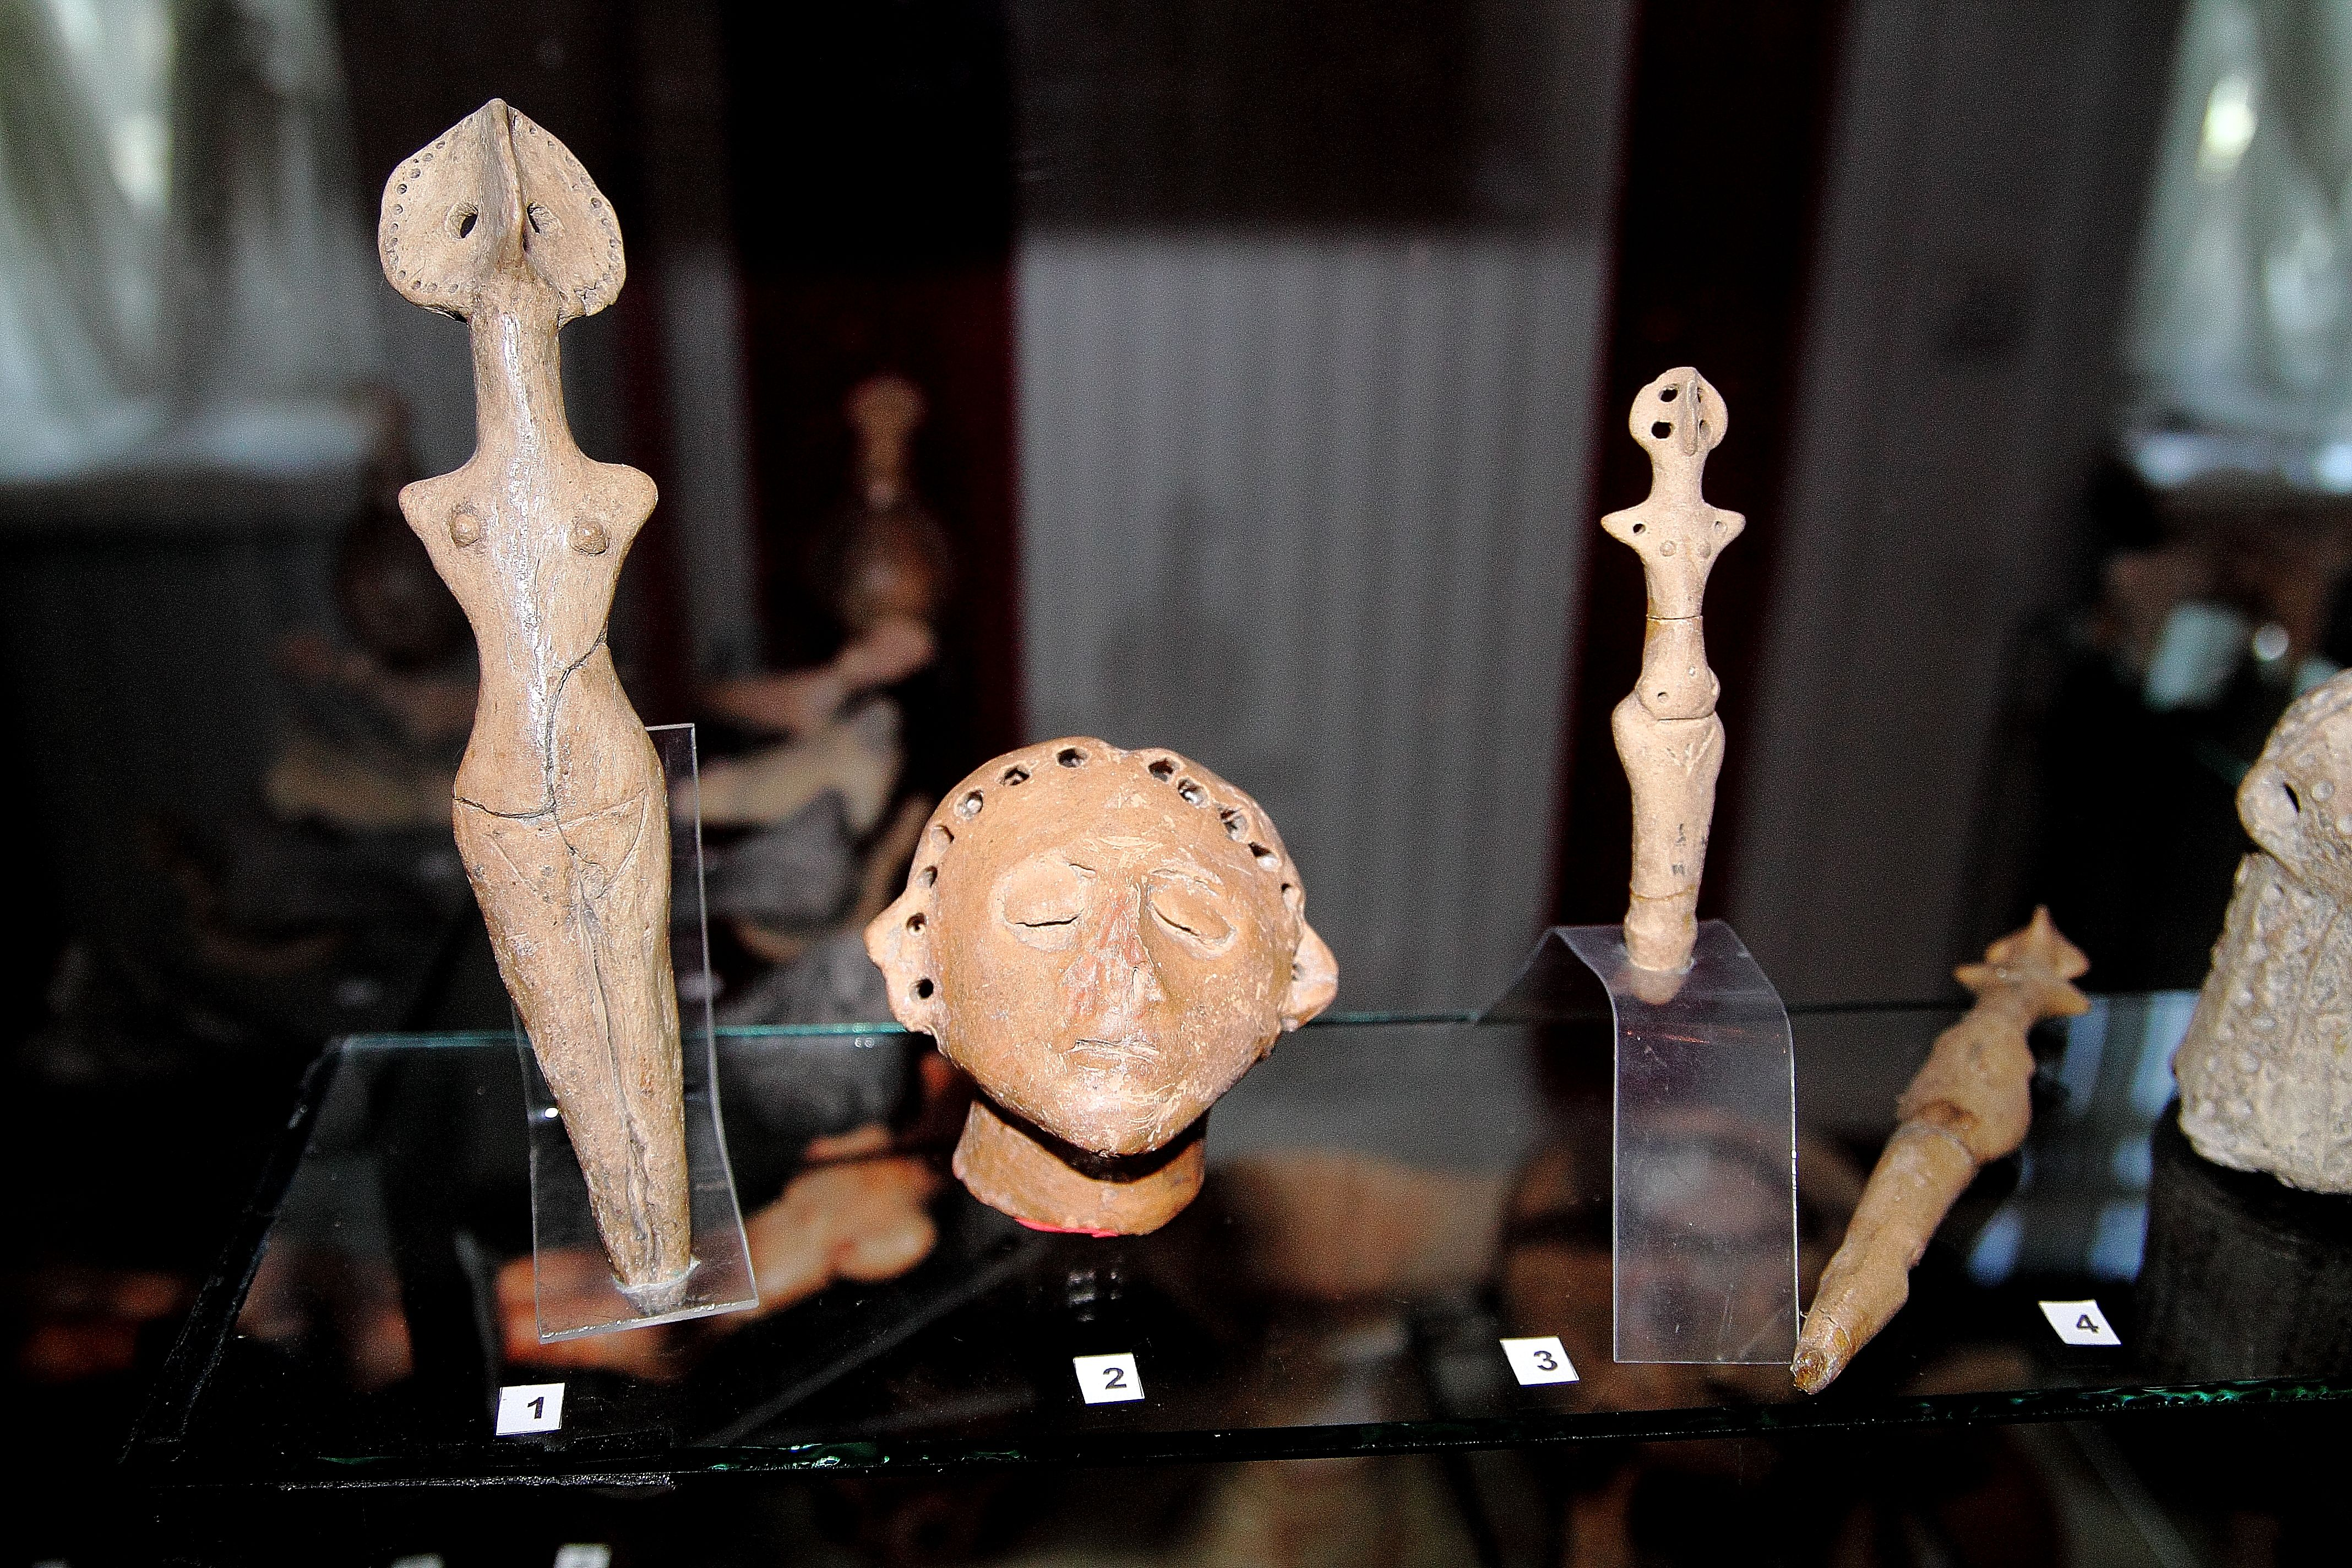 Pin by Jocelyn M Ellis on Antic ornaments Culture